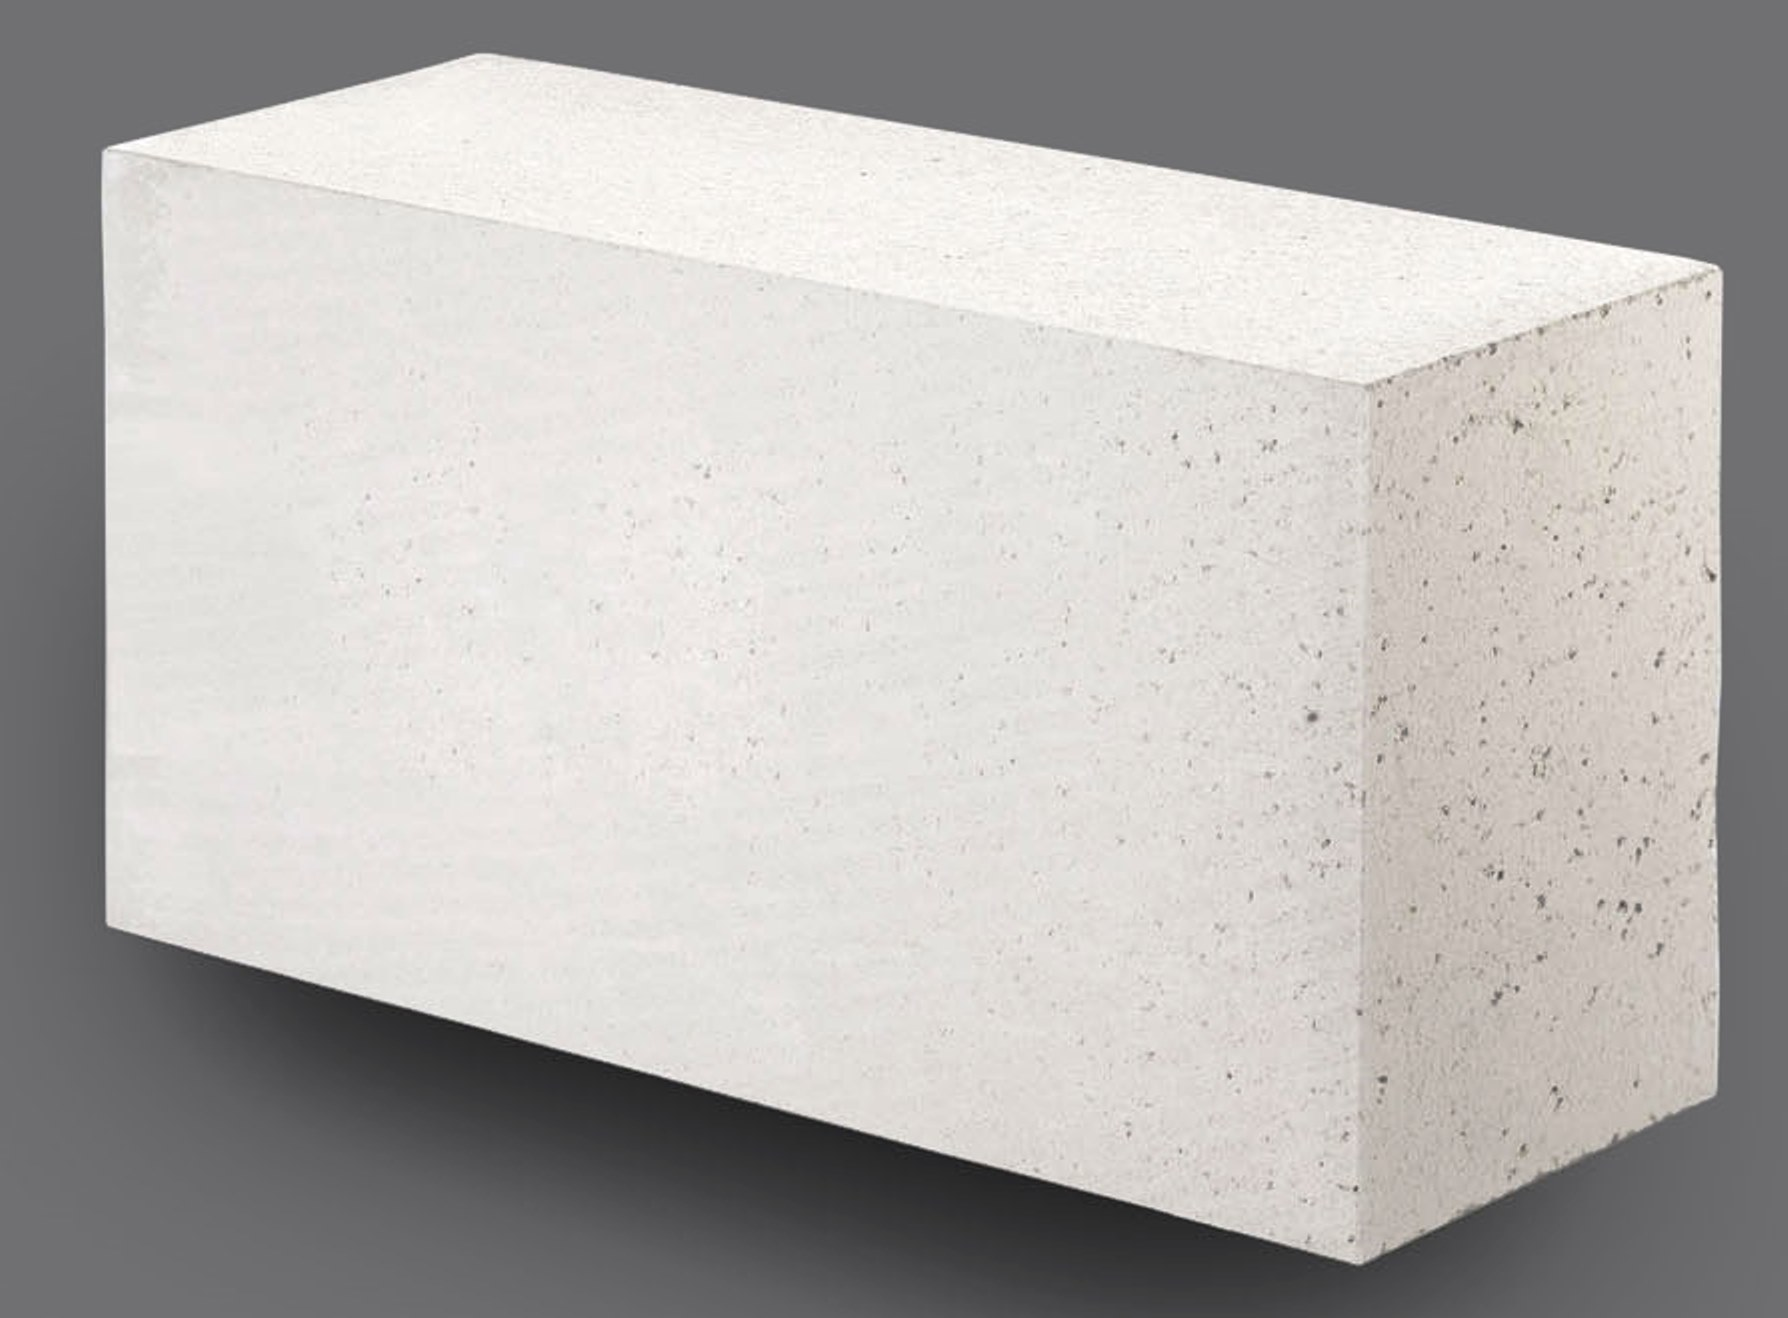 akyto betono blokelis bauroc universal  be griovelio